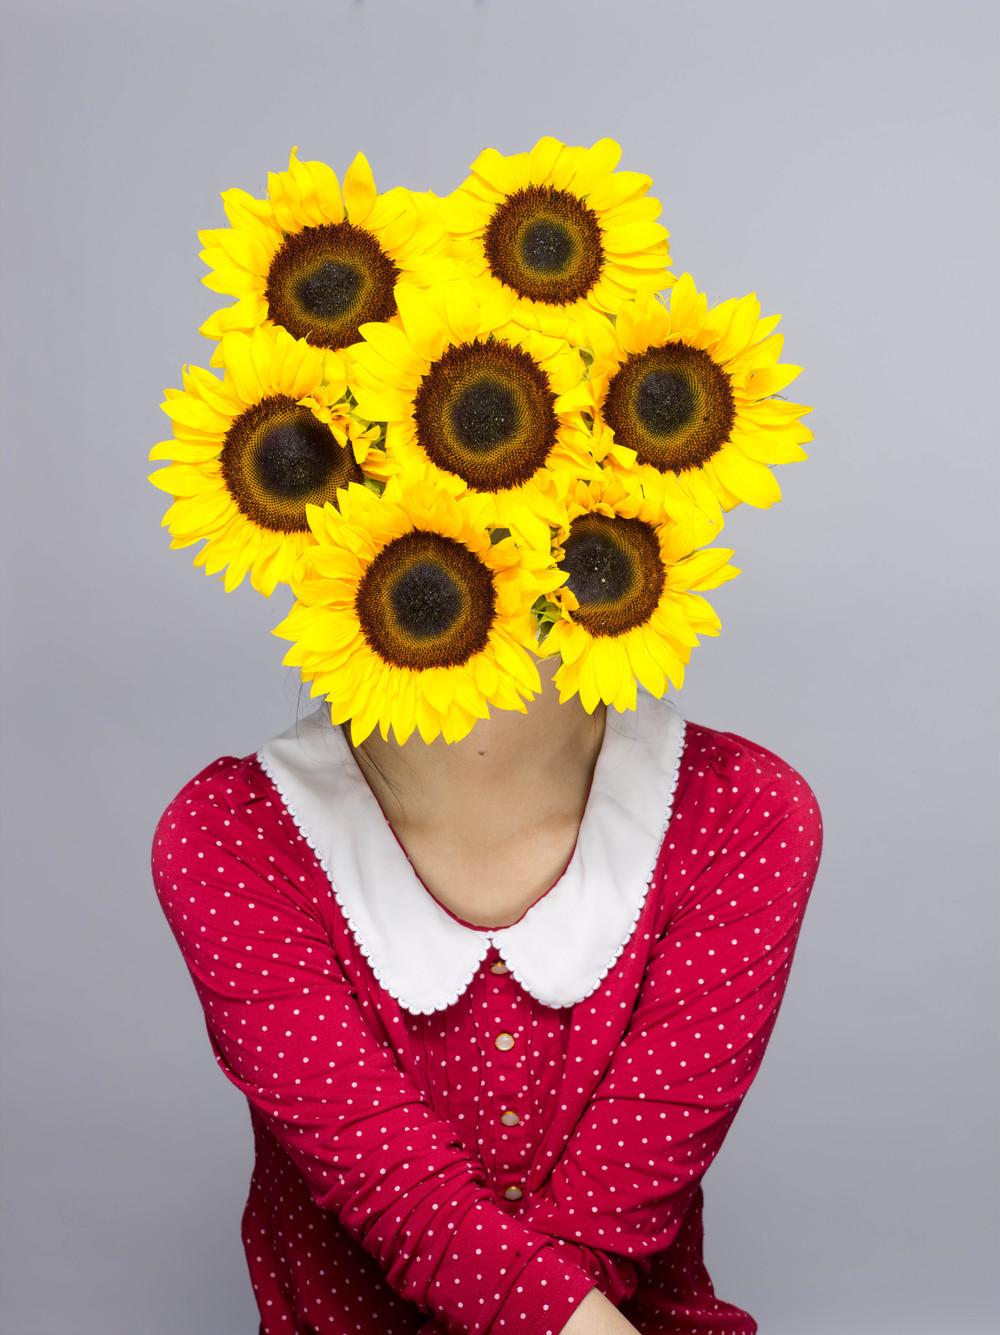 FLOWER HEADS 28974.jpg